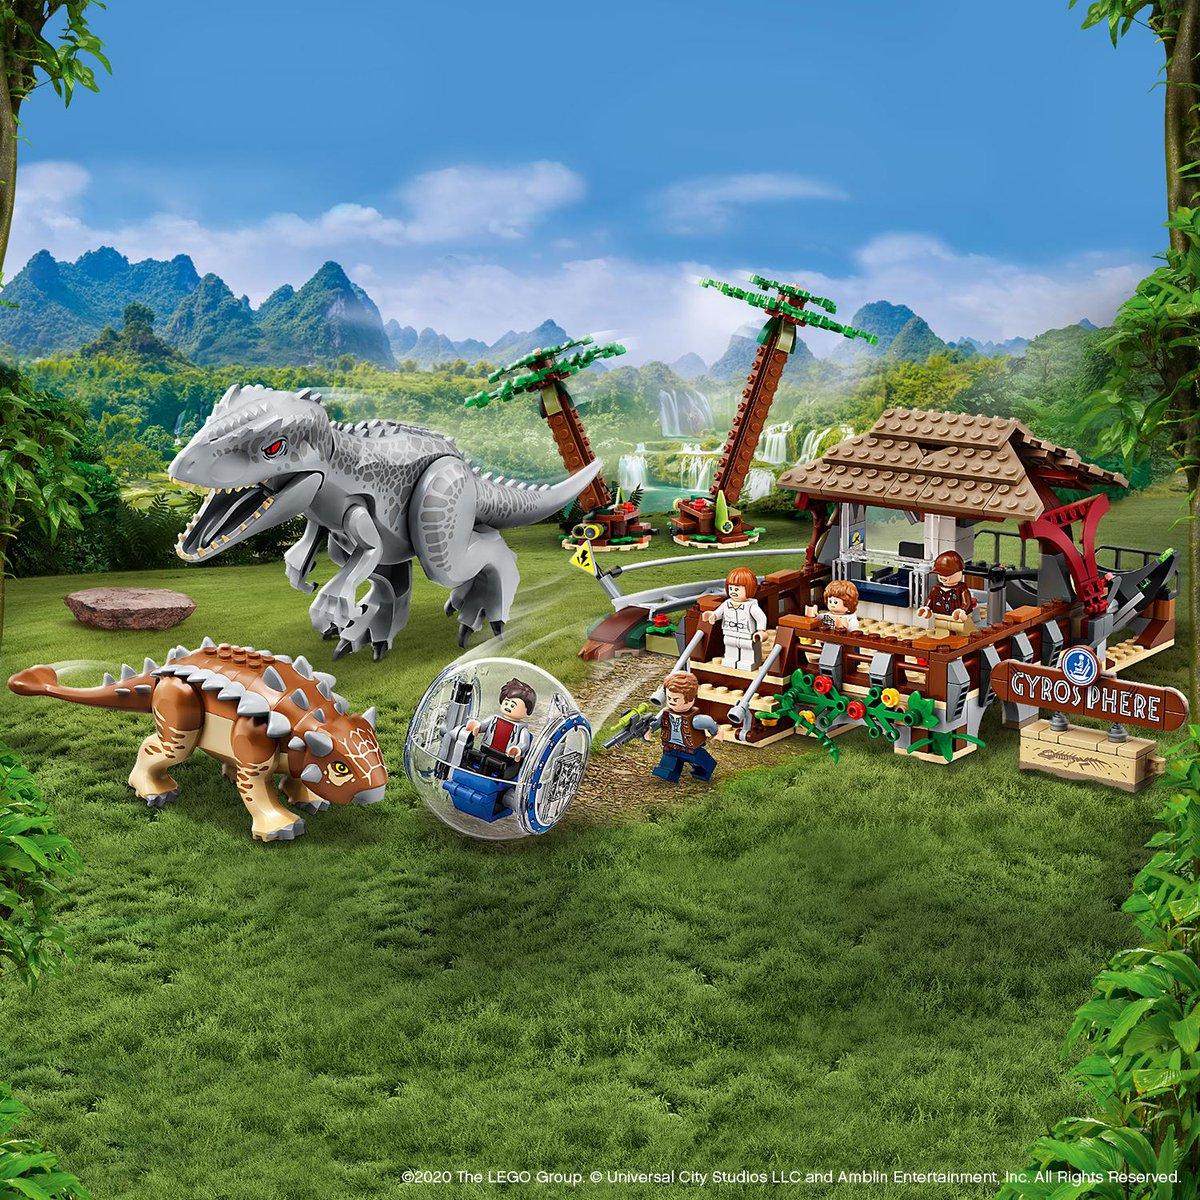 Get ready for dinosaur adventures with the new LEGO Jurassic World sets. Coming soon! #LEGOJurassicWorld #JurassicWorld